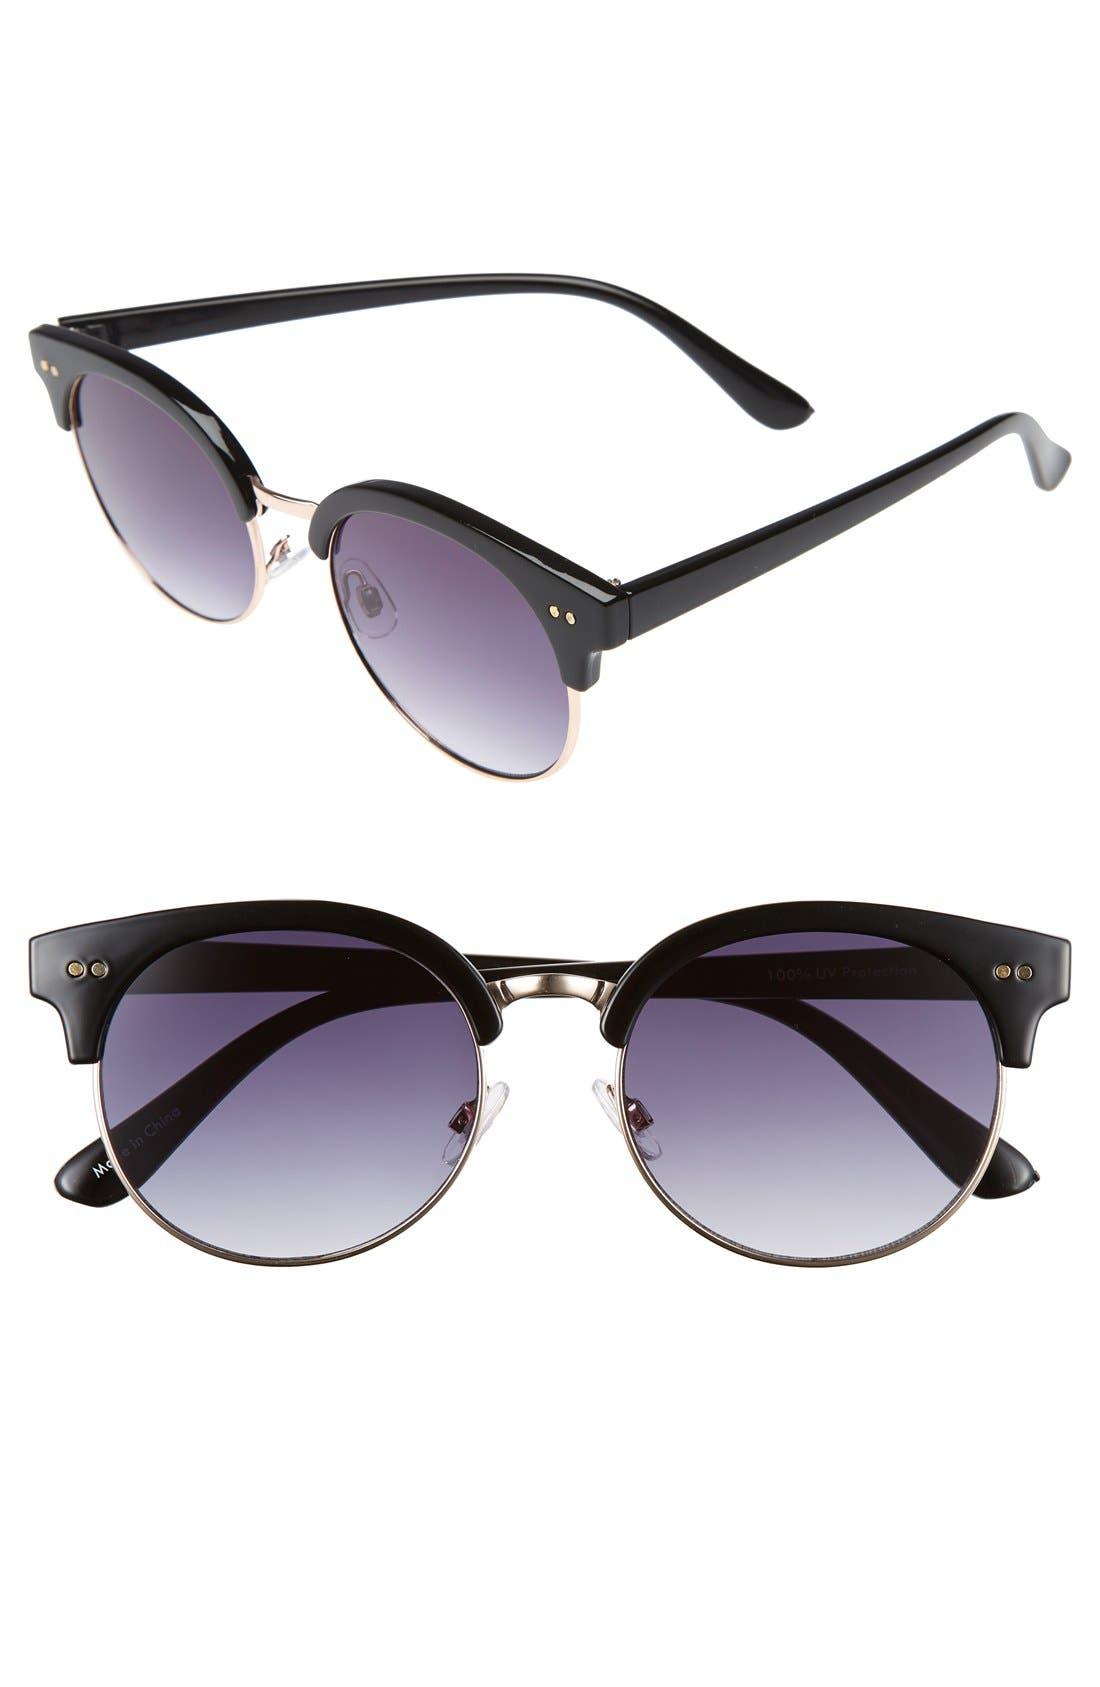 Main Image - BP. 55mm Sunglasses